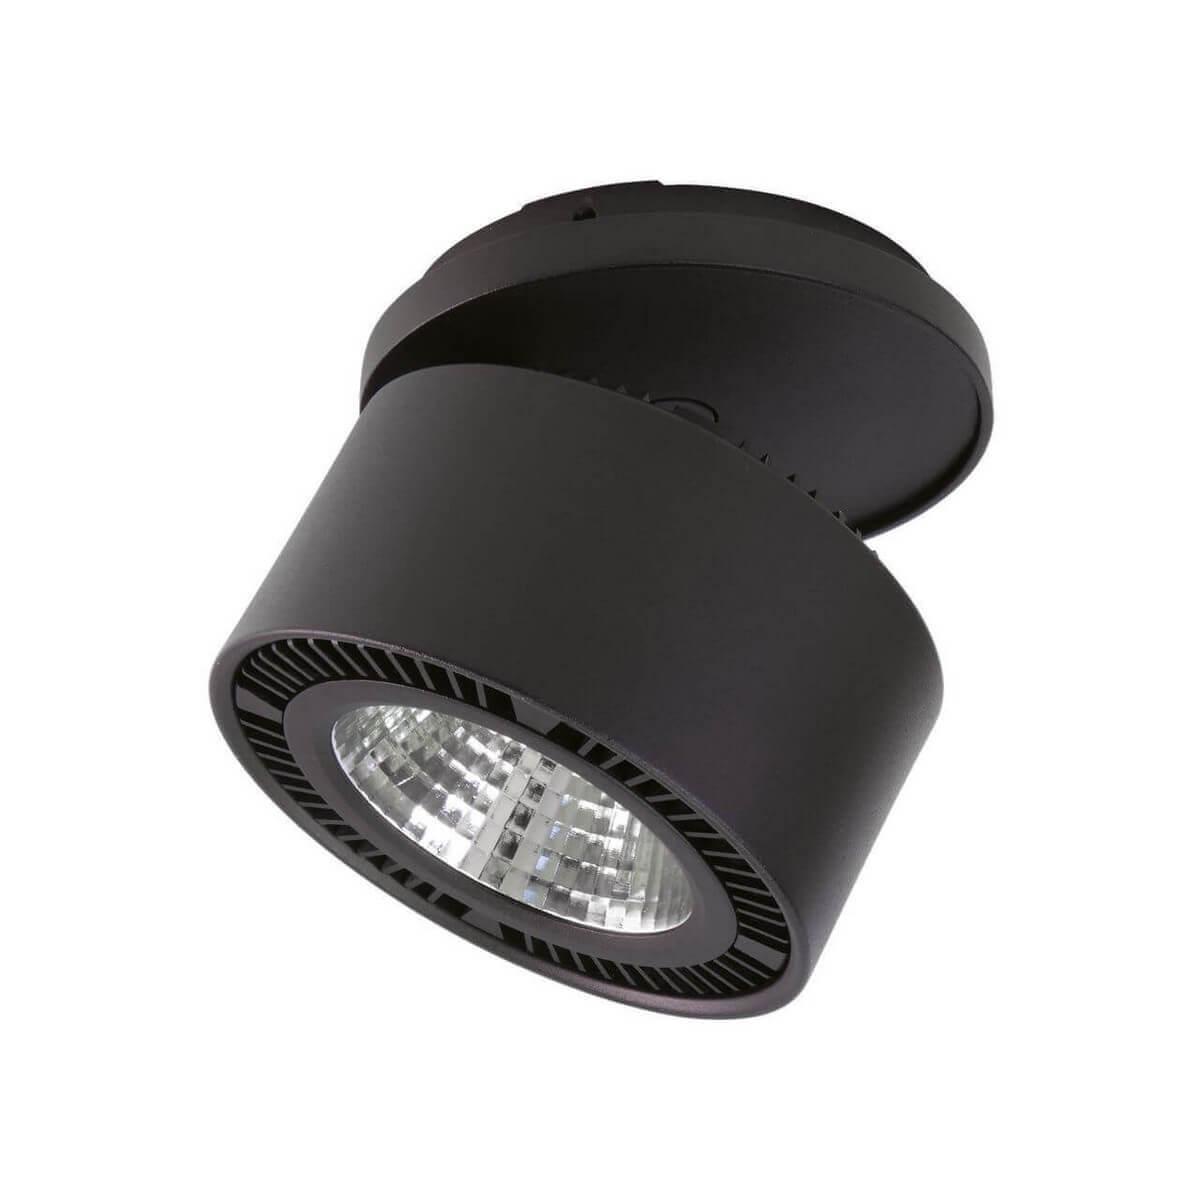 Спот Lightstar 213847 Forte Inca спот lightstar forte inca 213847